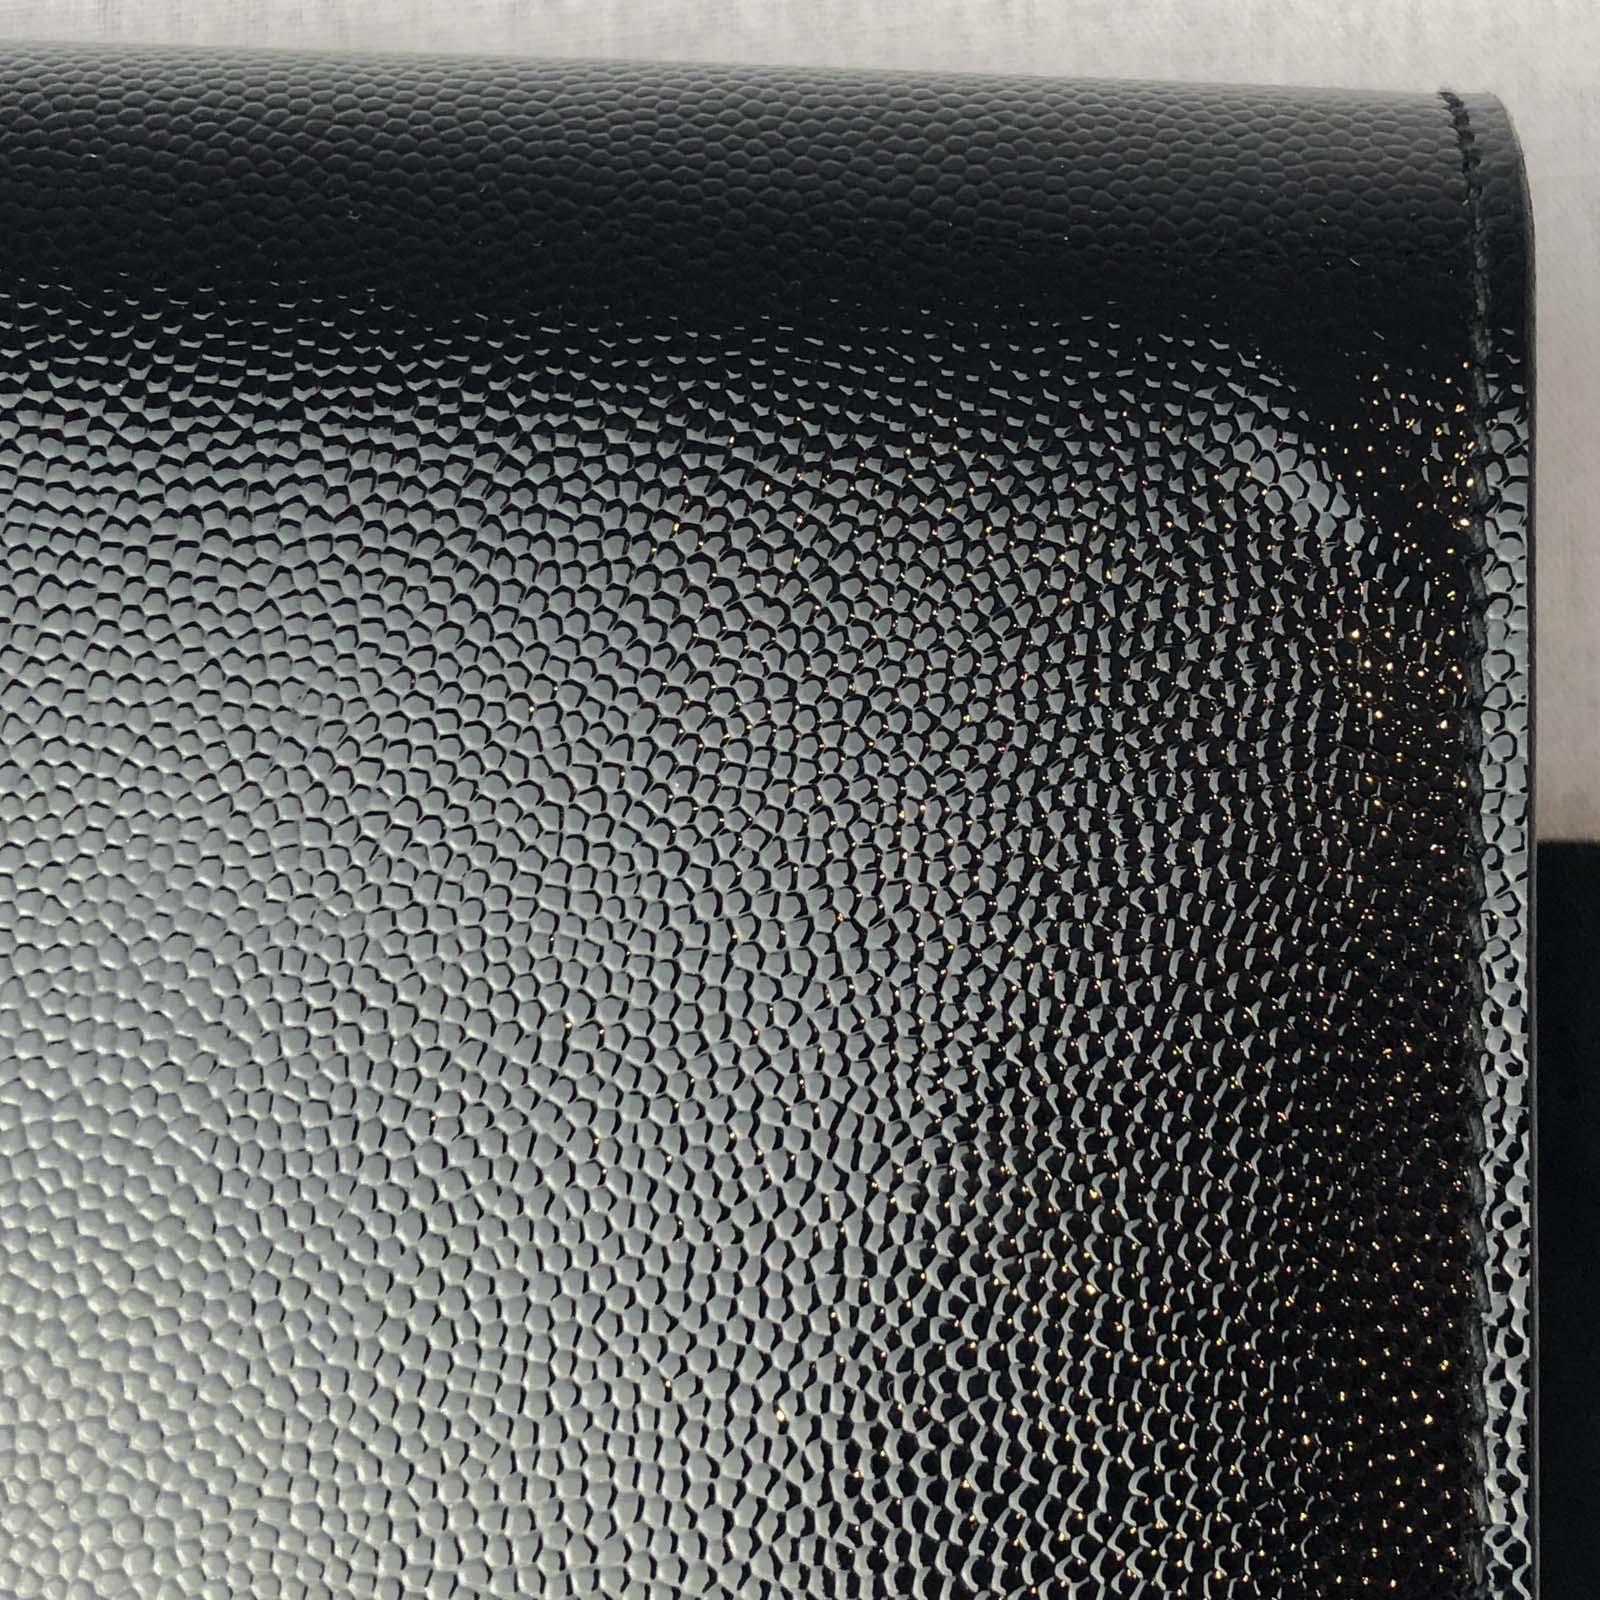 9c99b58316e7e Saint Laurent YSL Black Cassandre Kate Clutch Bag - Handbagholic